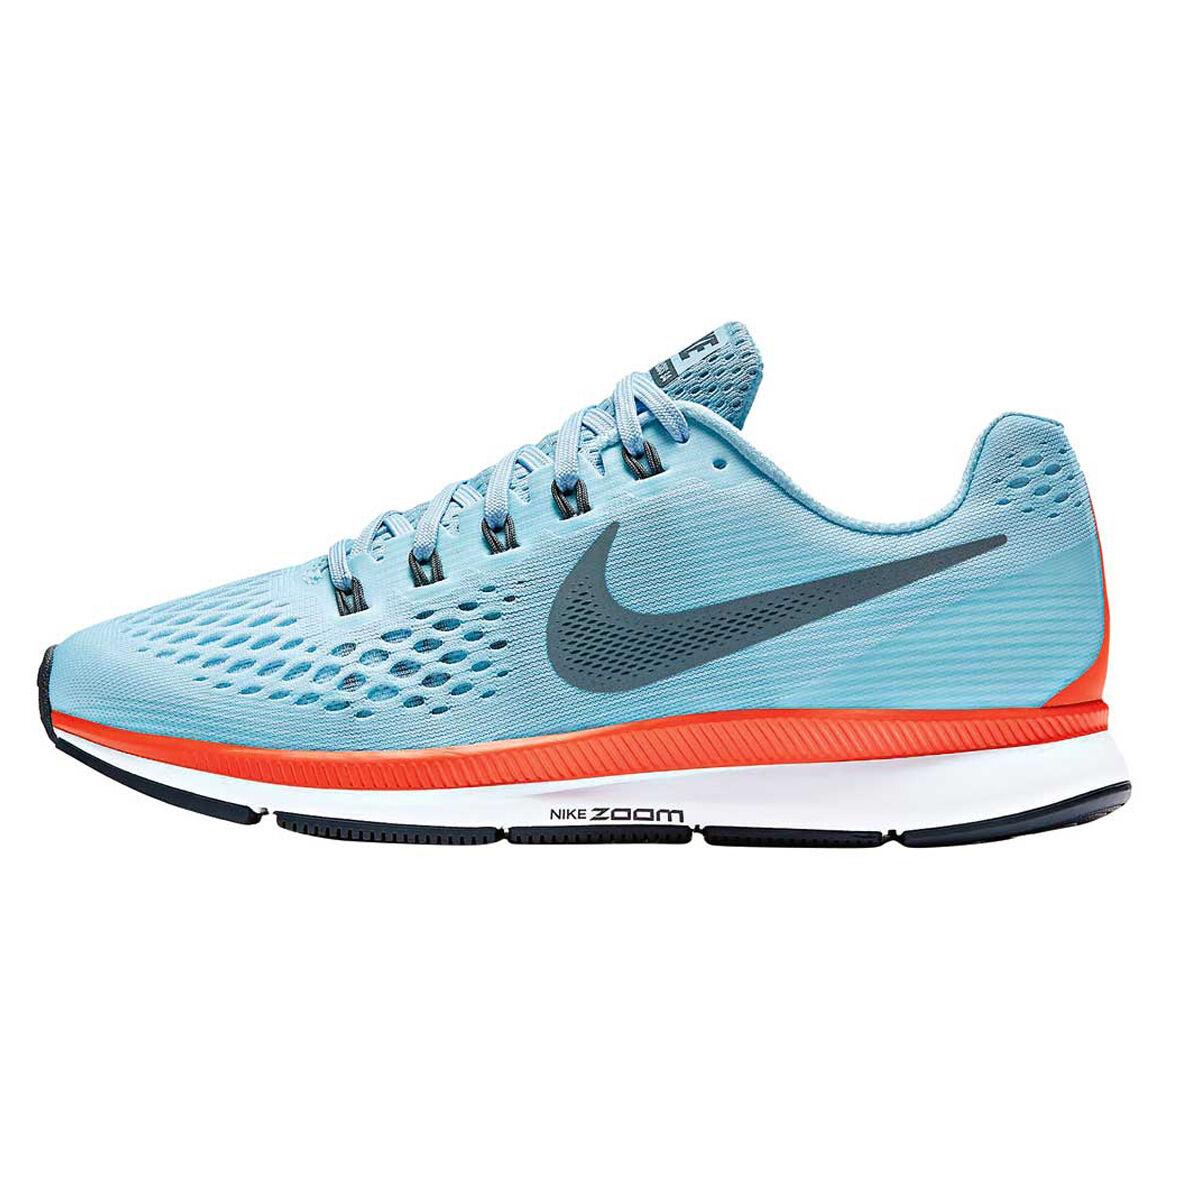 2fc6bfc77dc5 ... 50% off nike air zoom pegasus 34 womens running shoes blue orange us 6  blue